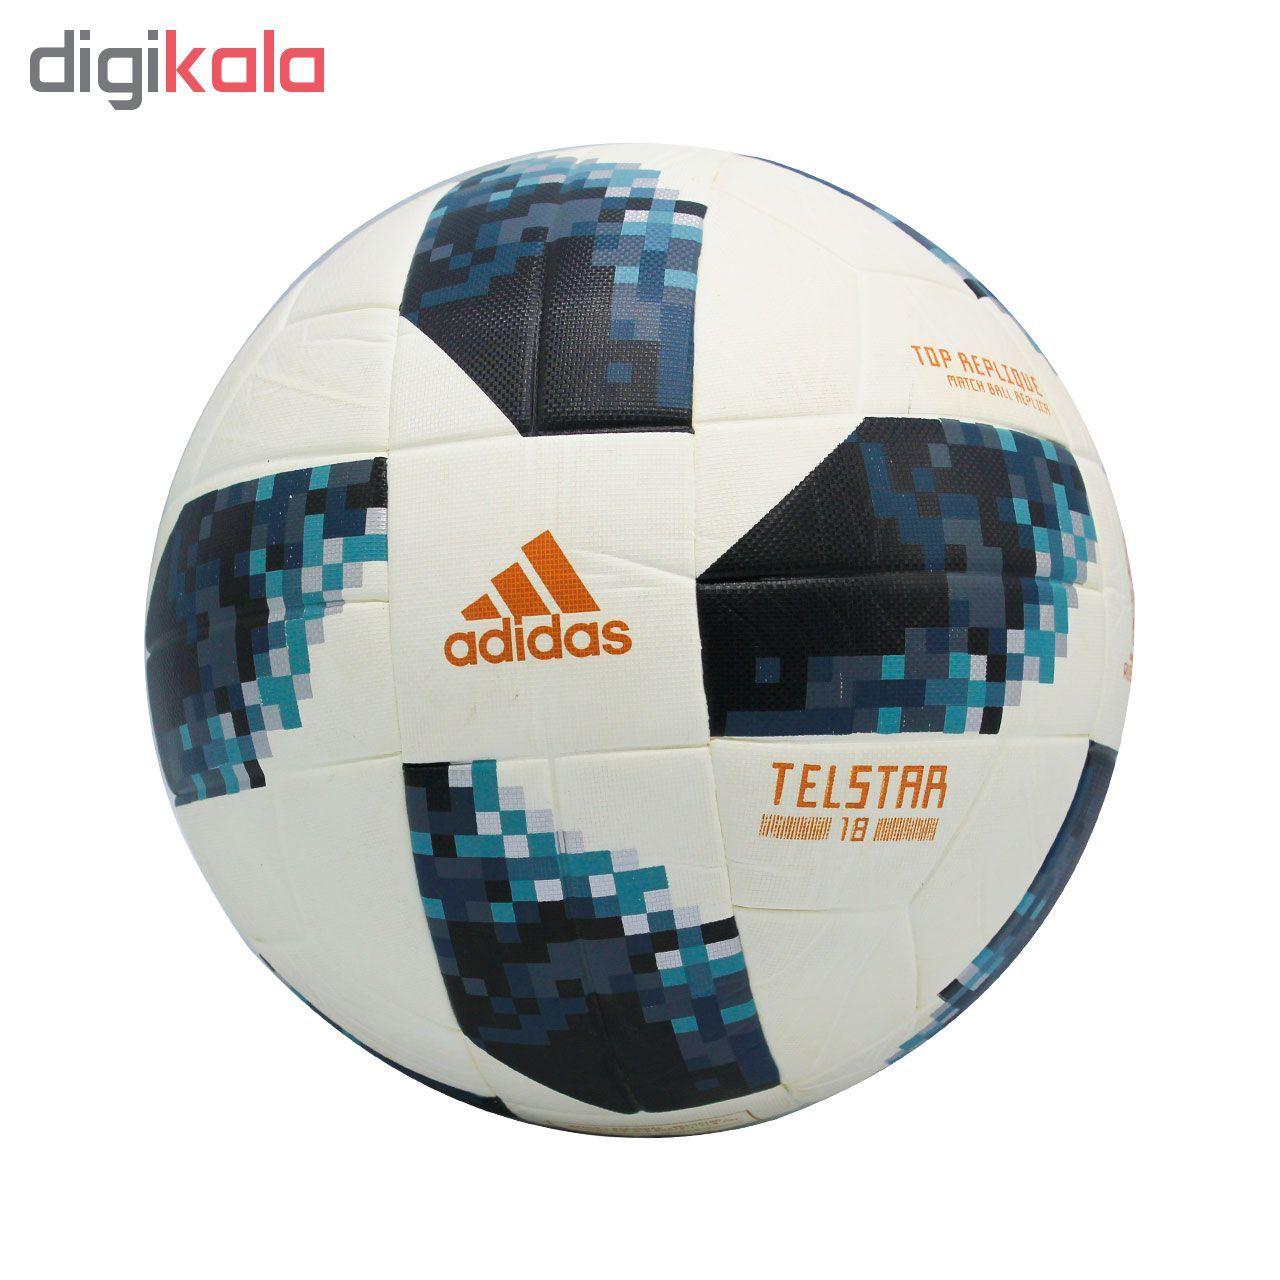 توپ فوتبال آدیداس مدل جام جهانی RUSSIA 2018 main 1 1